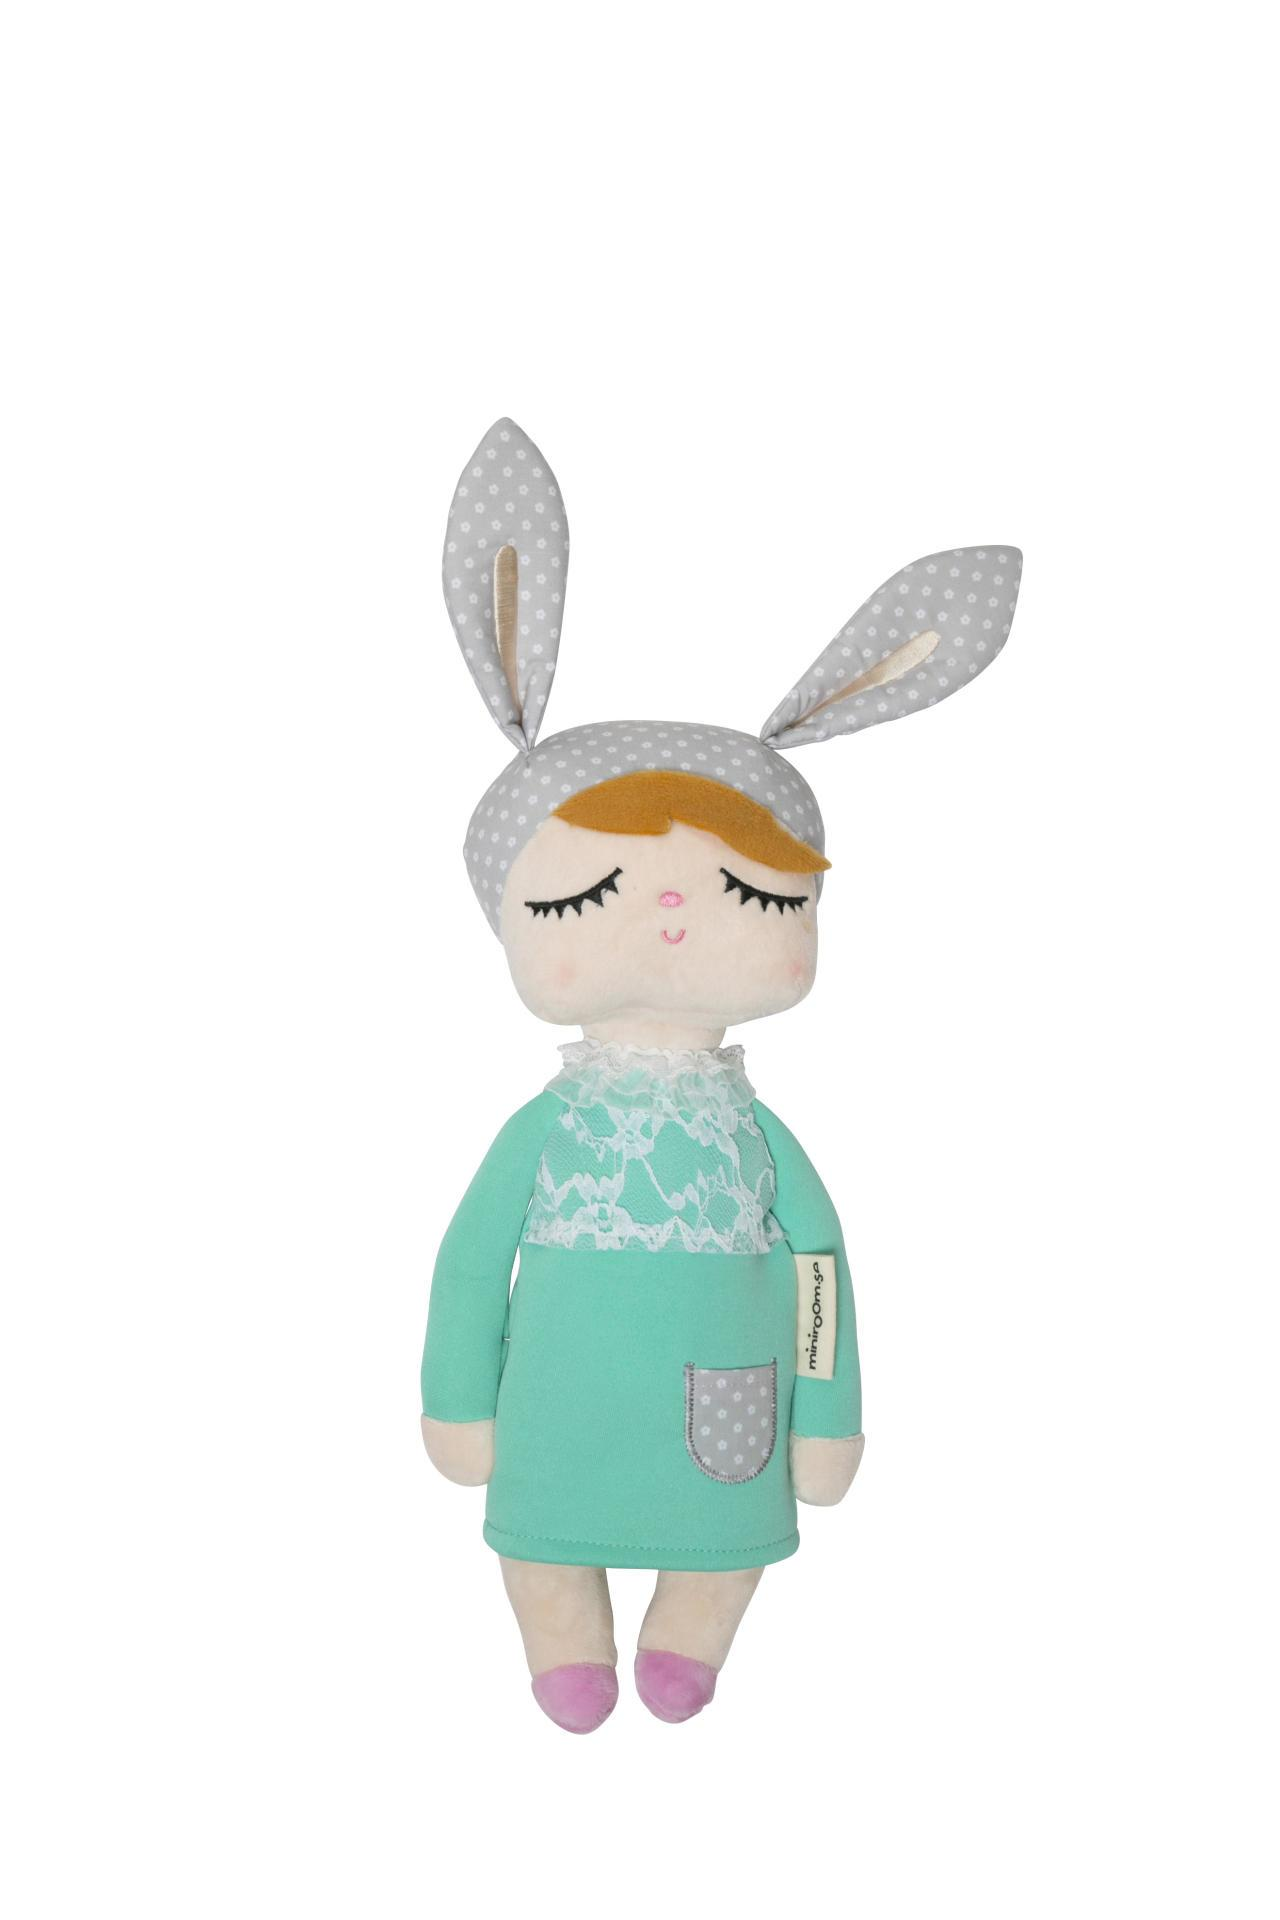 miniroom Králičí panenka Lille Kanin New Green, zelená barva, šedá barva, textil